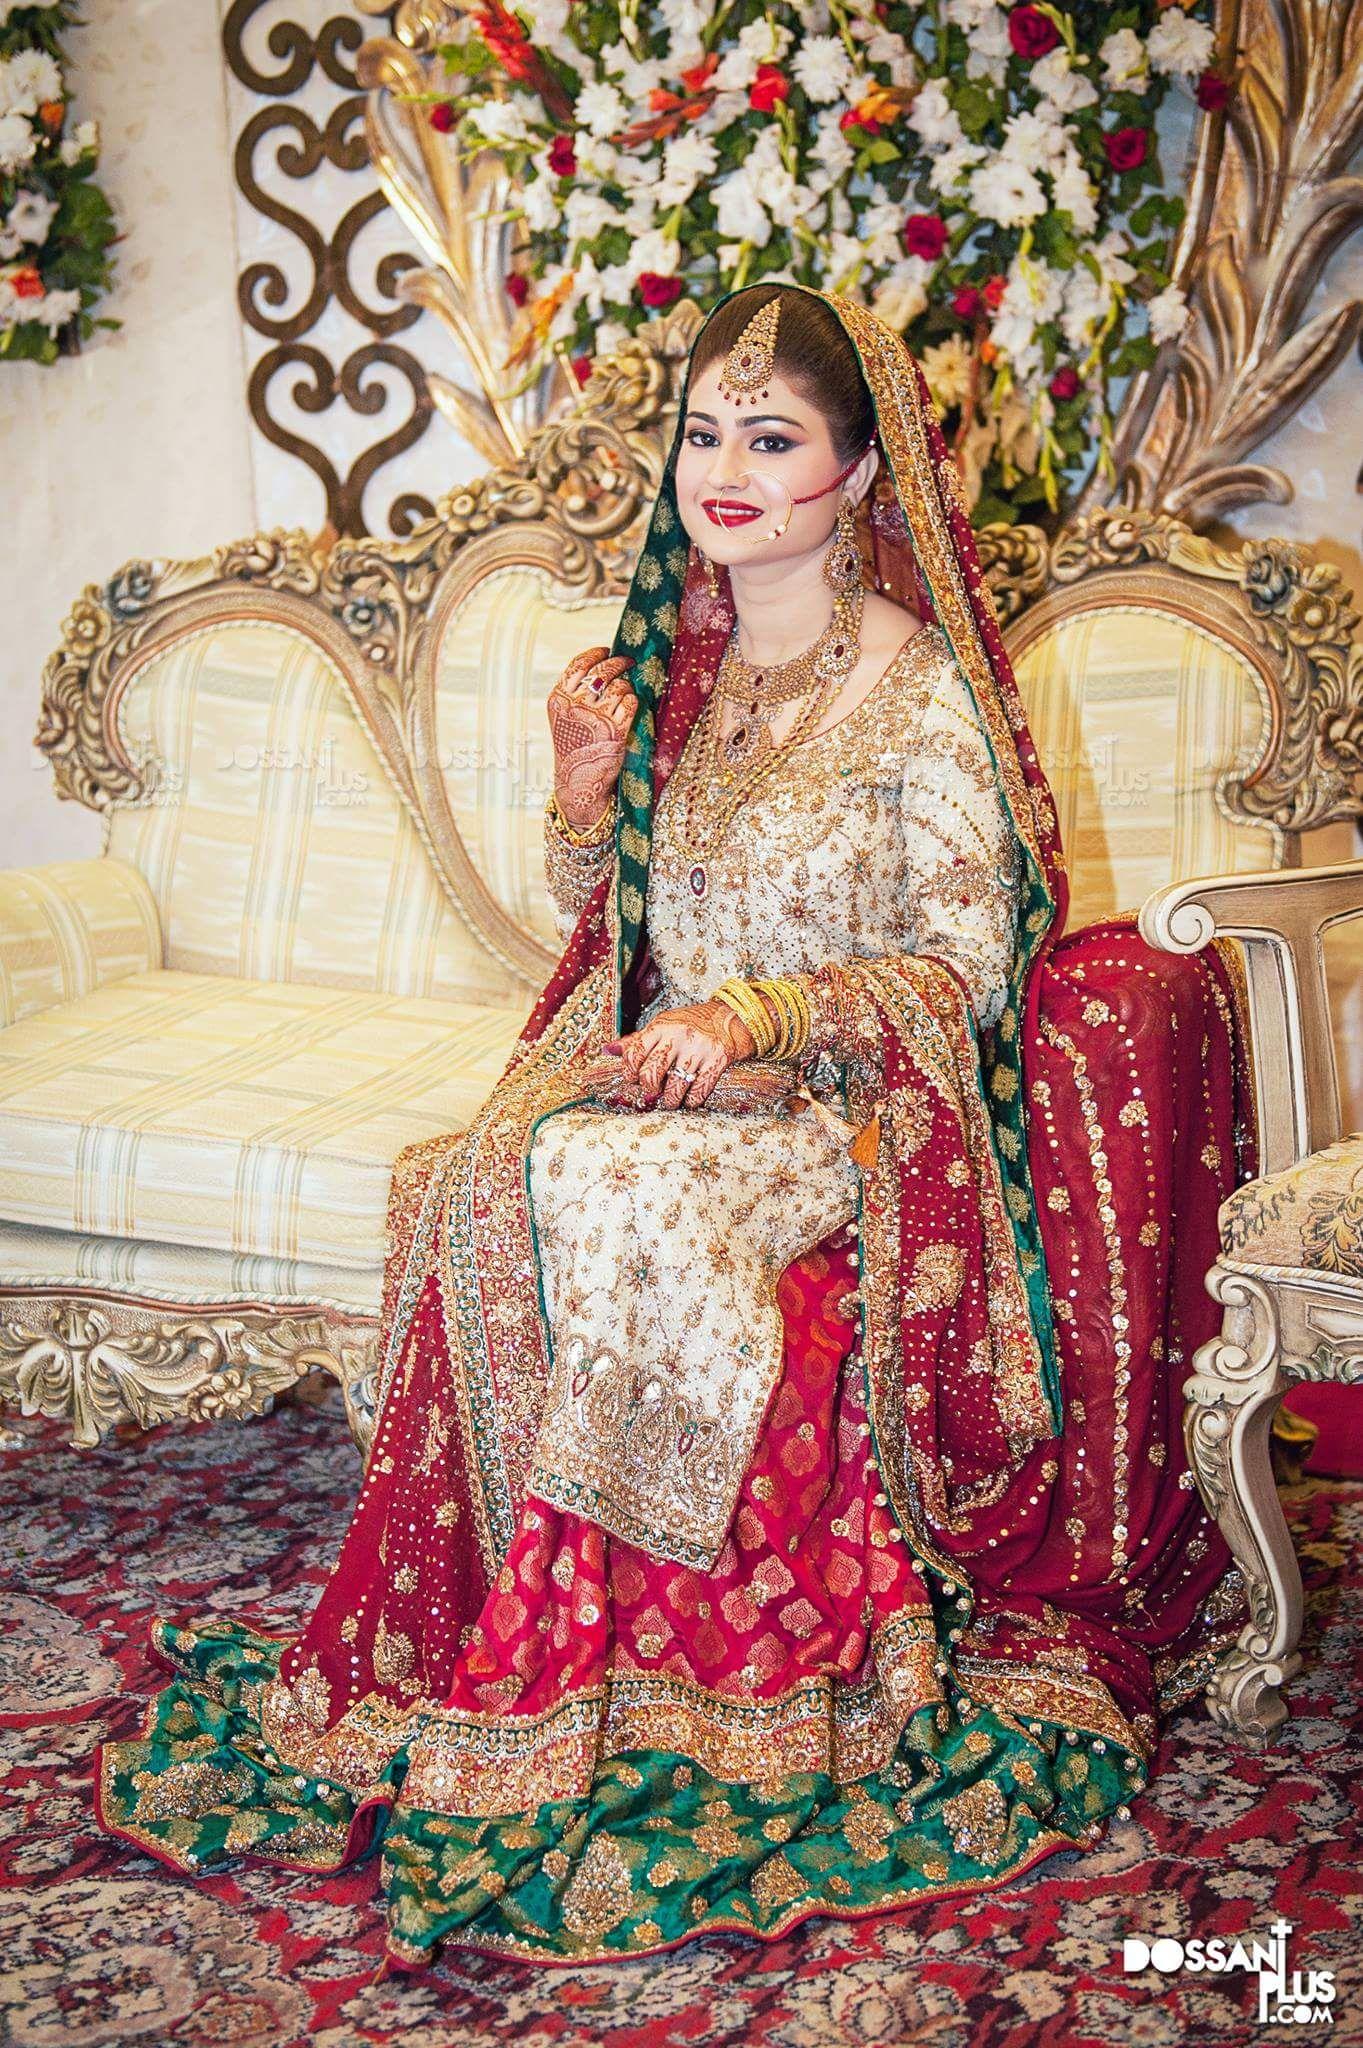 Beautiful bride and Dossani plus photography | Bridal wear | Pinterest